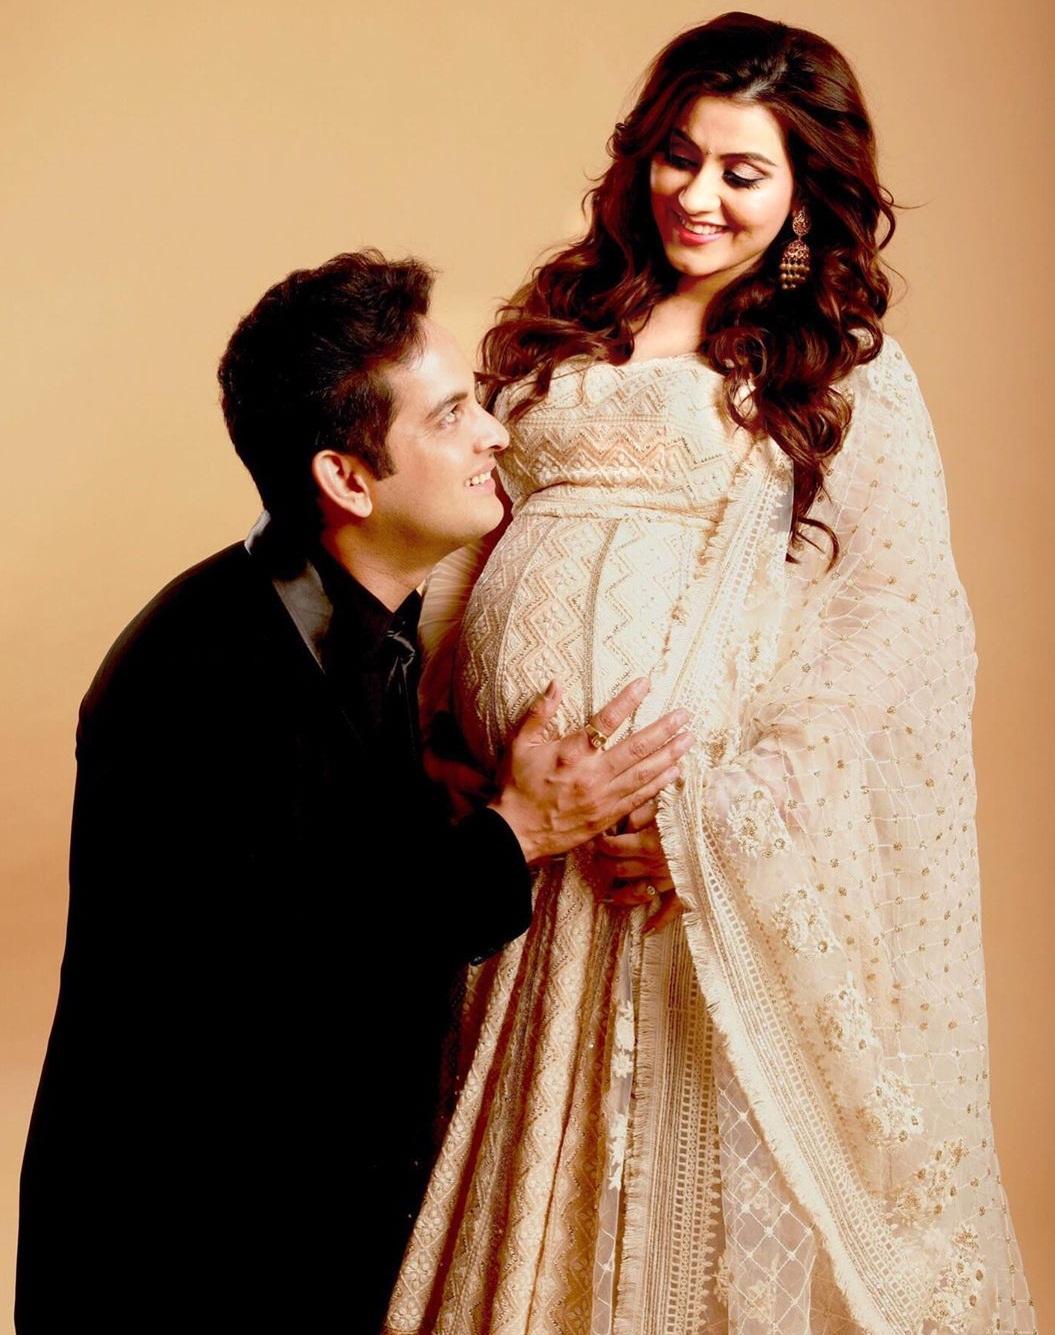 Bollywood Tadka, प्रियंका कालांत्री इमेज, प्रियंका कालांत्री फोटो, प्रियंका कालांत्री पिक्चर,